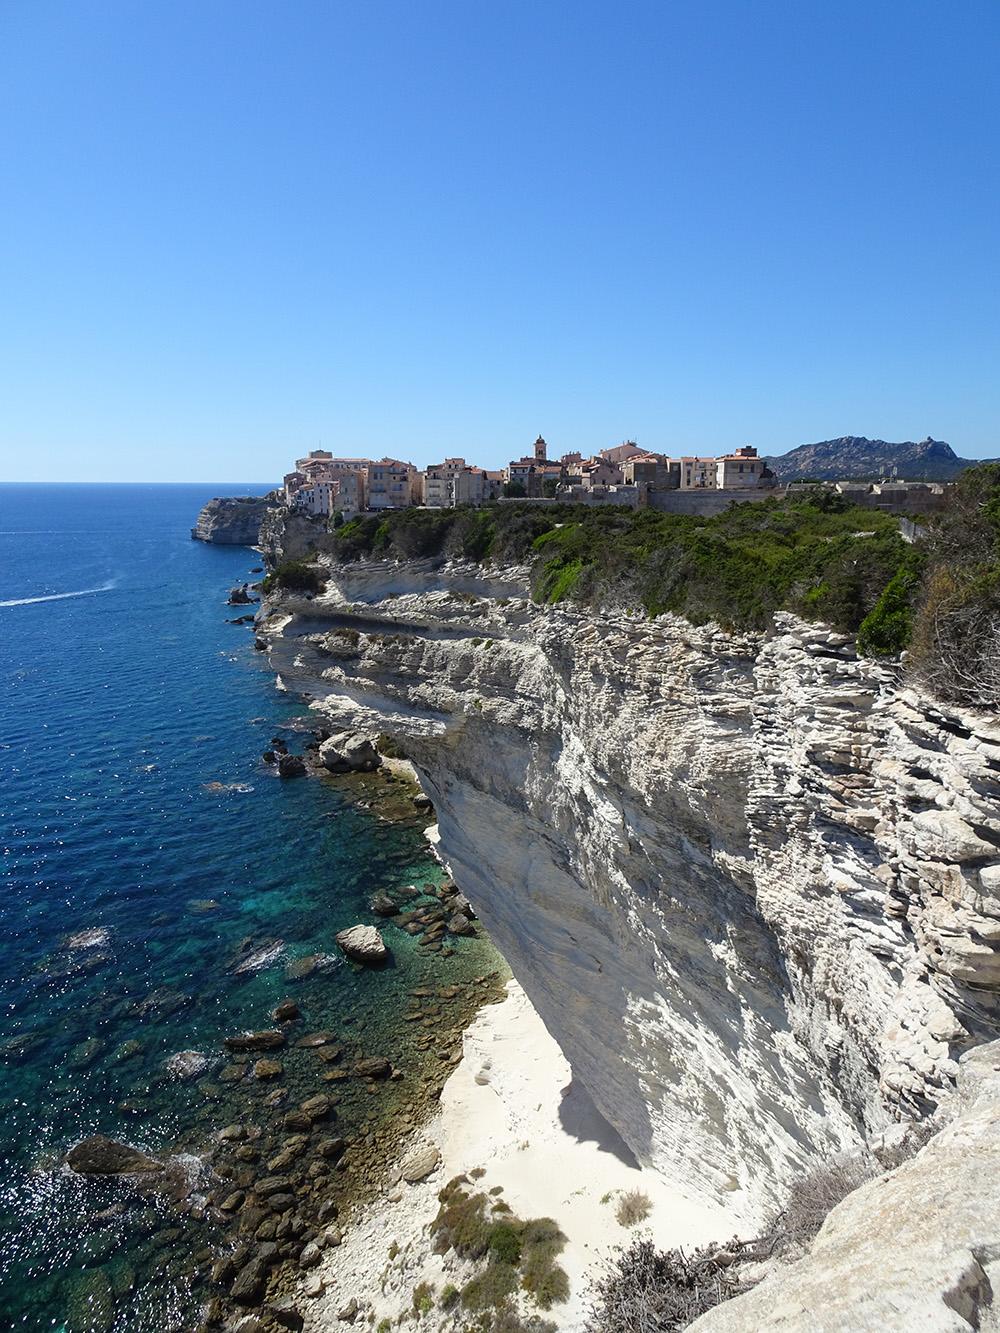 Het spectaculaire Bonifacio in Corsica - Europese eilanden